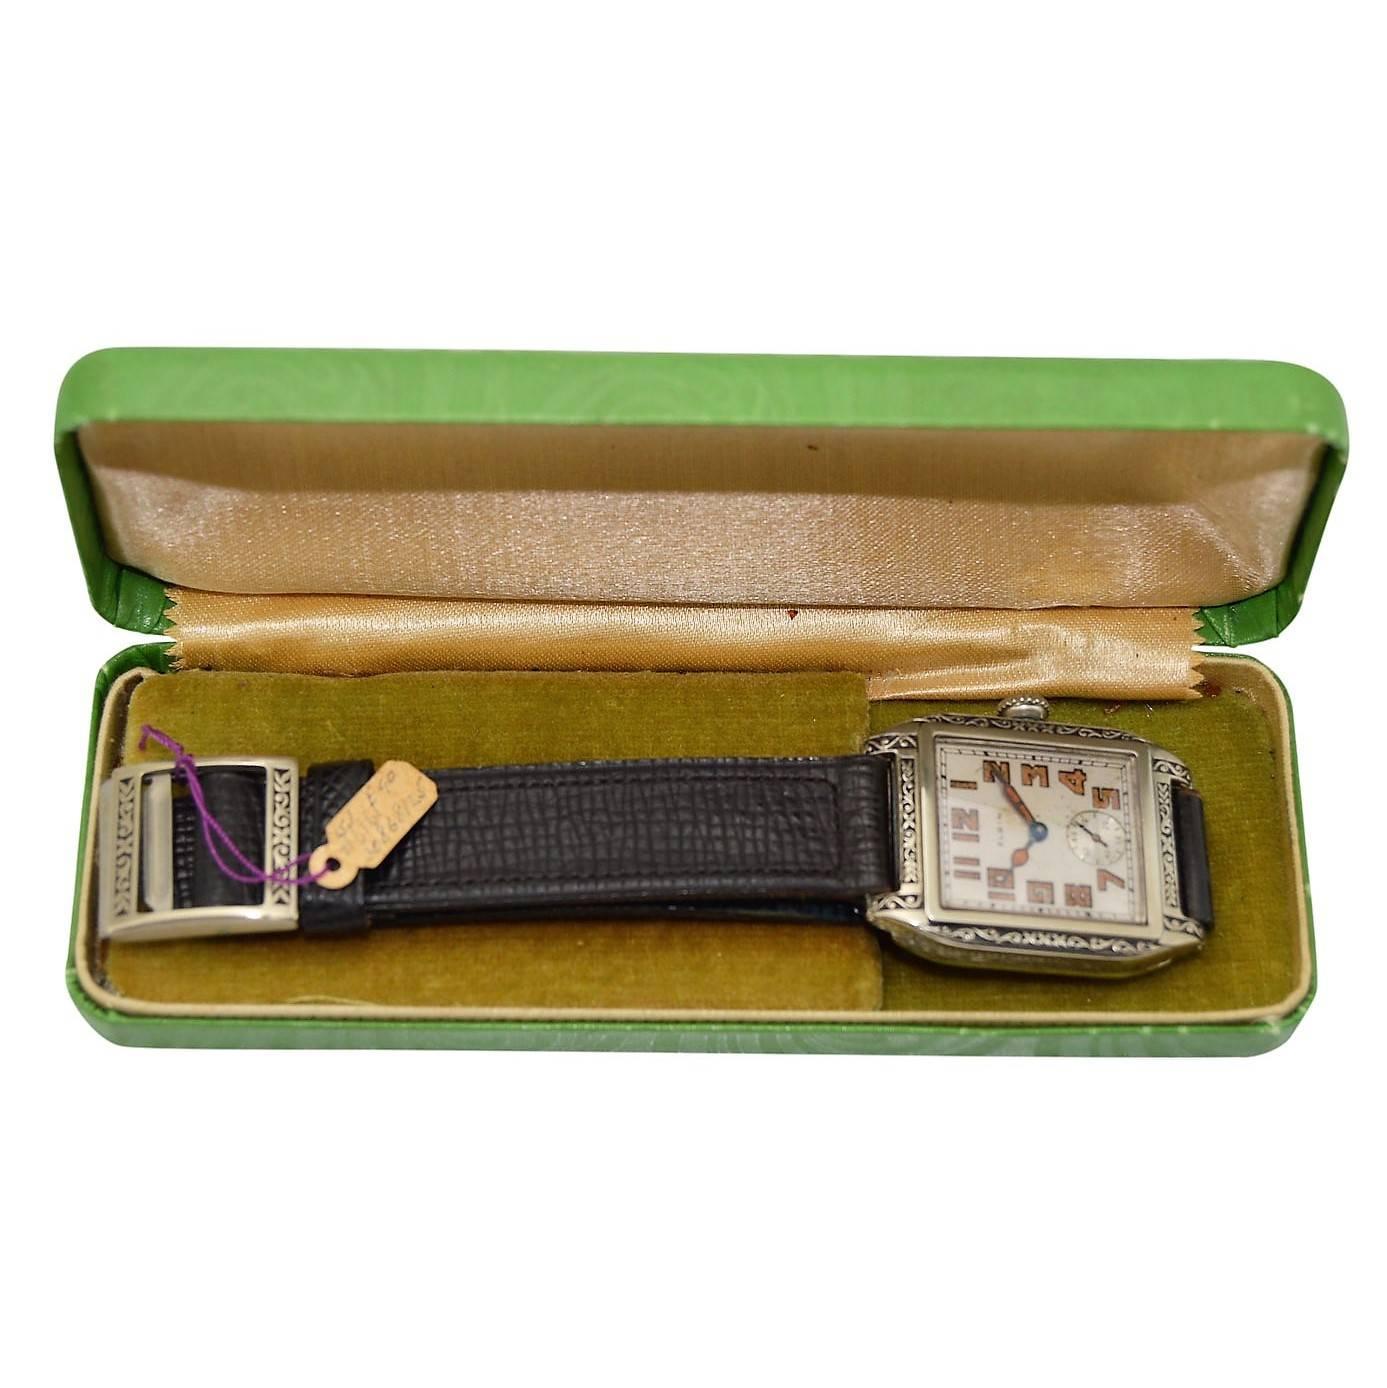 Elgin White Gold Filled Art Deco Manual Wristwatch, circa 1926